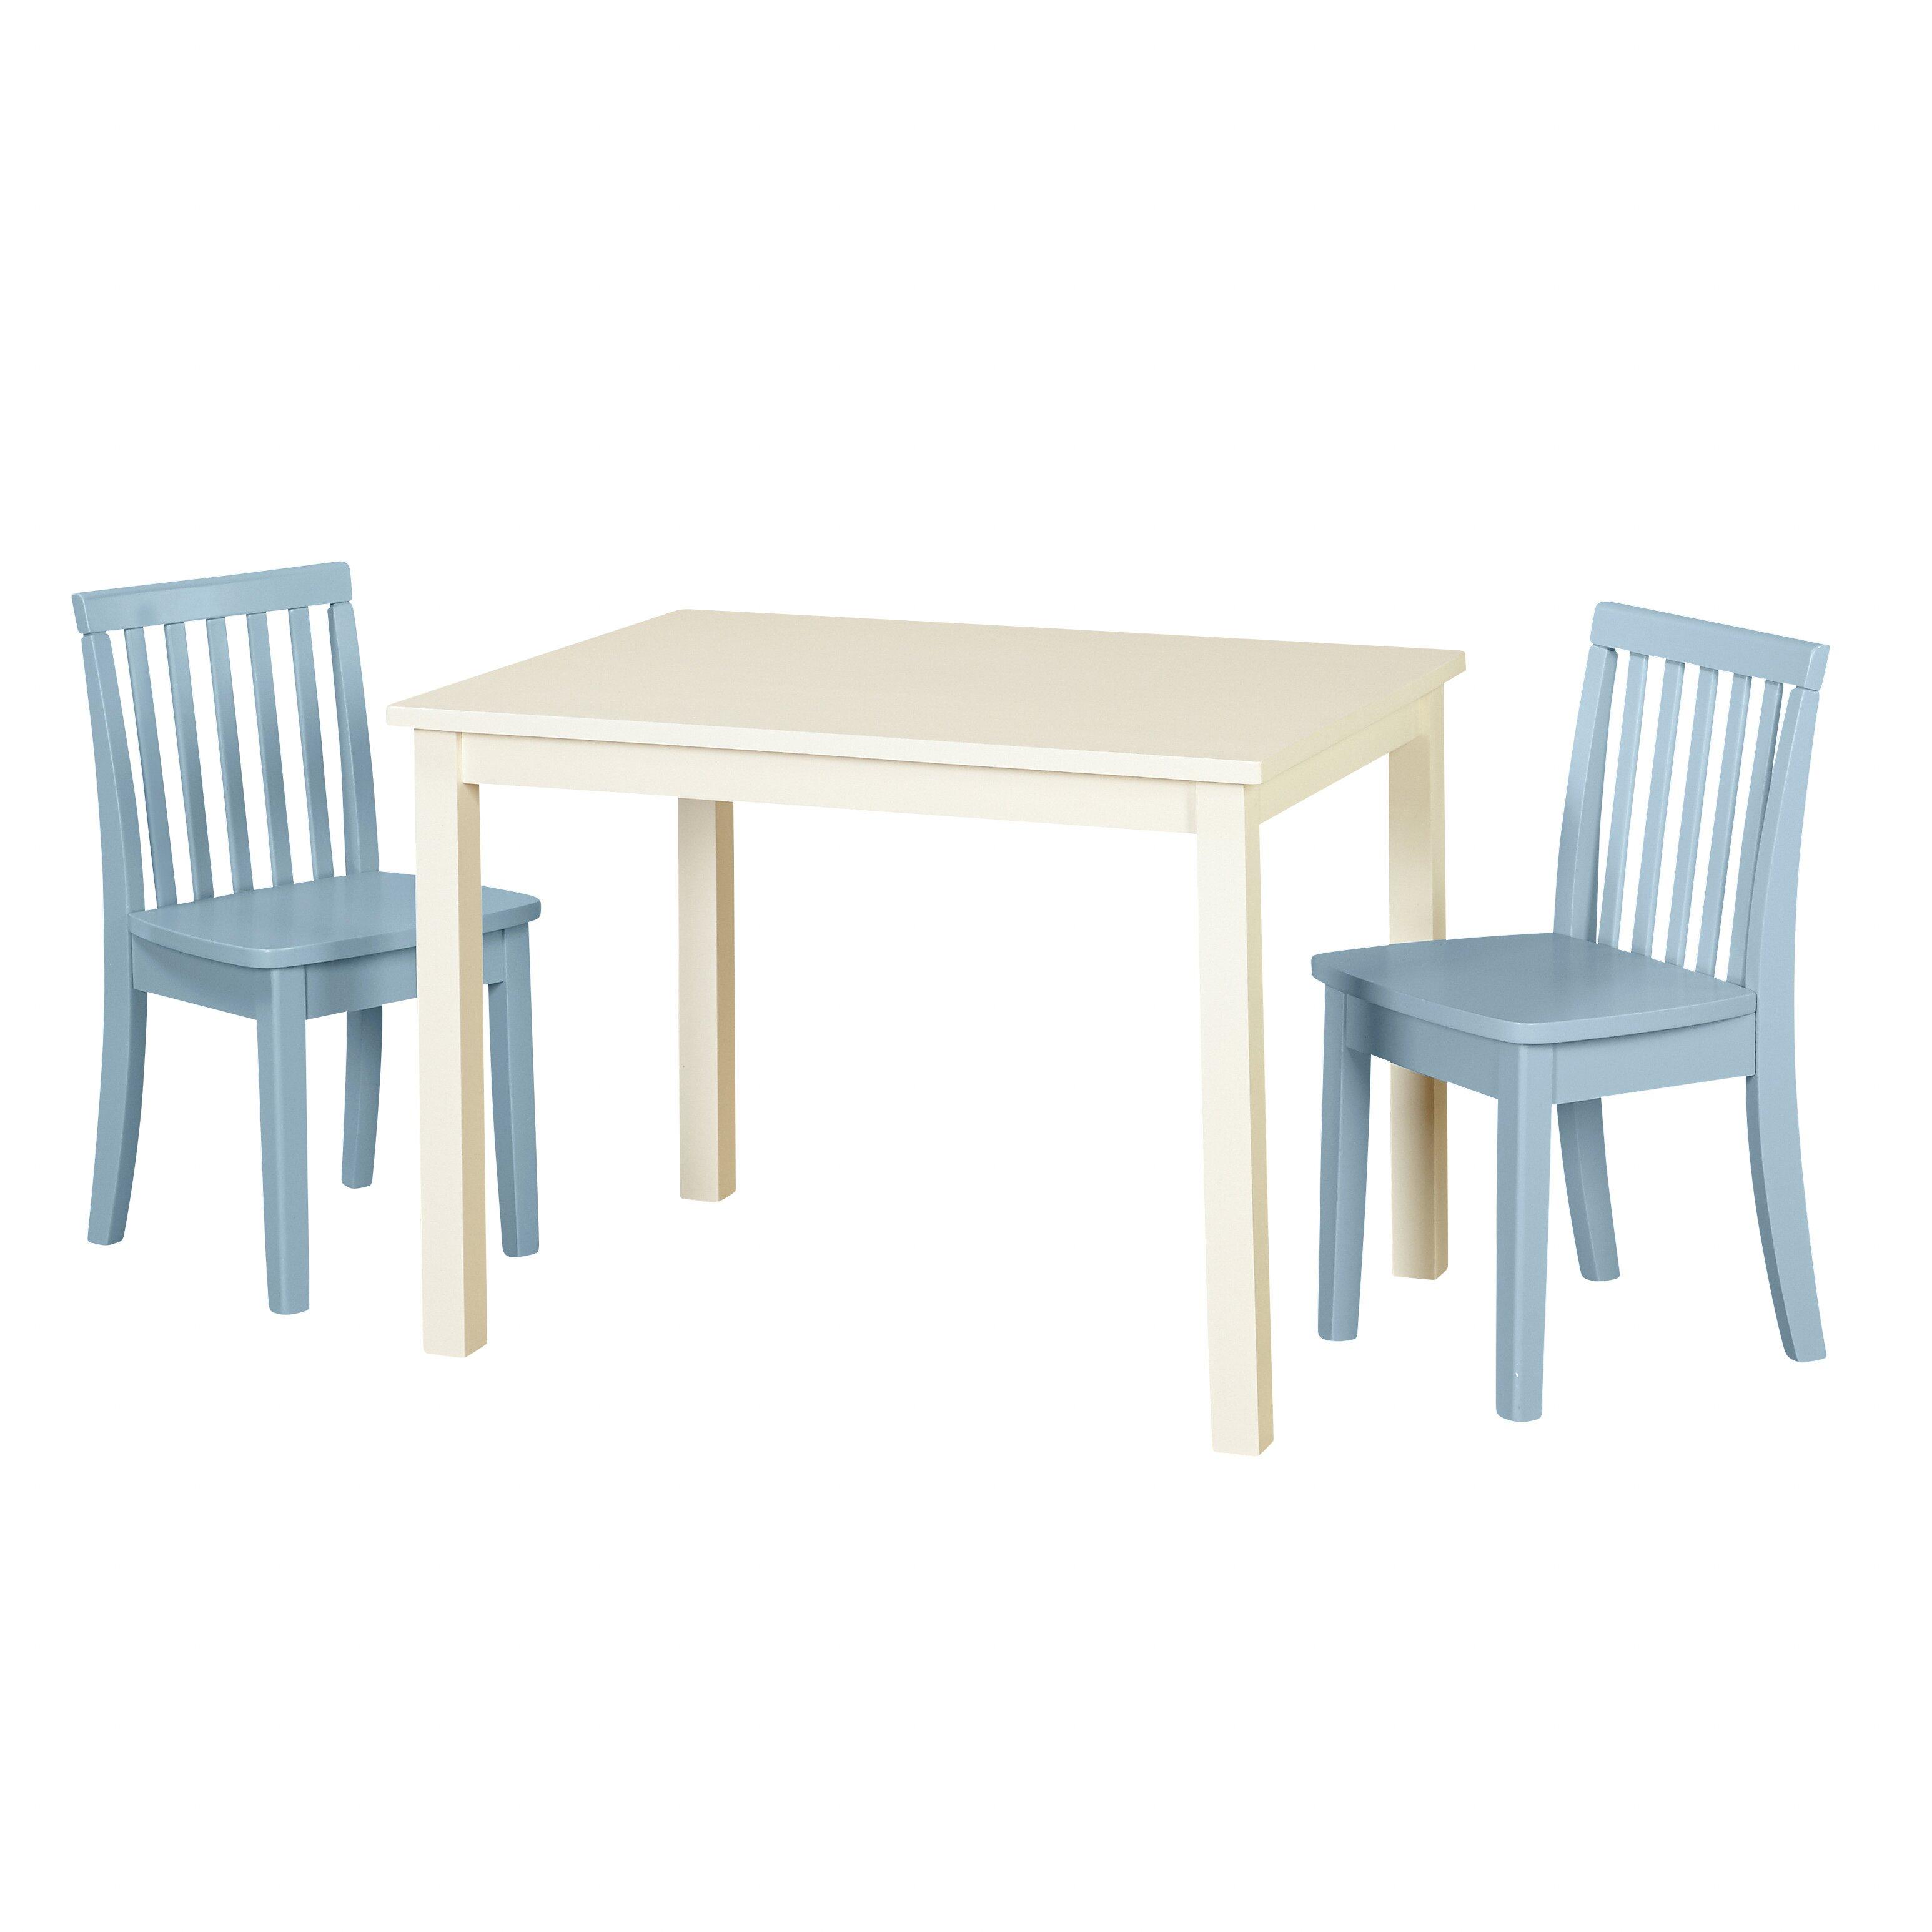 Kidkraft Heart Table And Chair Set Modern Rectangle Kids Table Chair Sets Allmodern